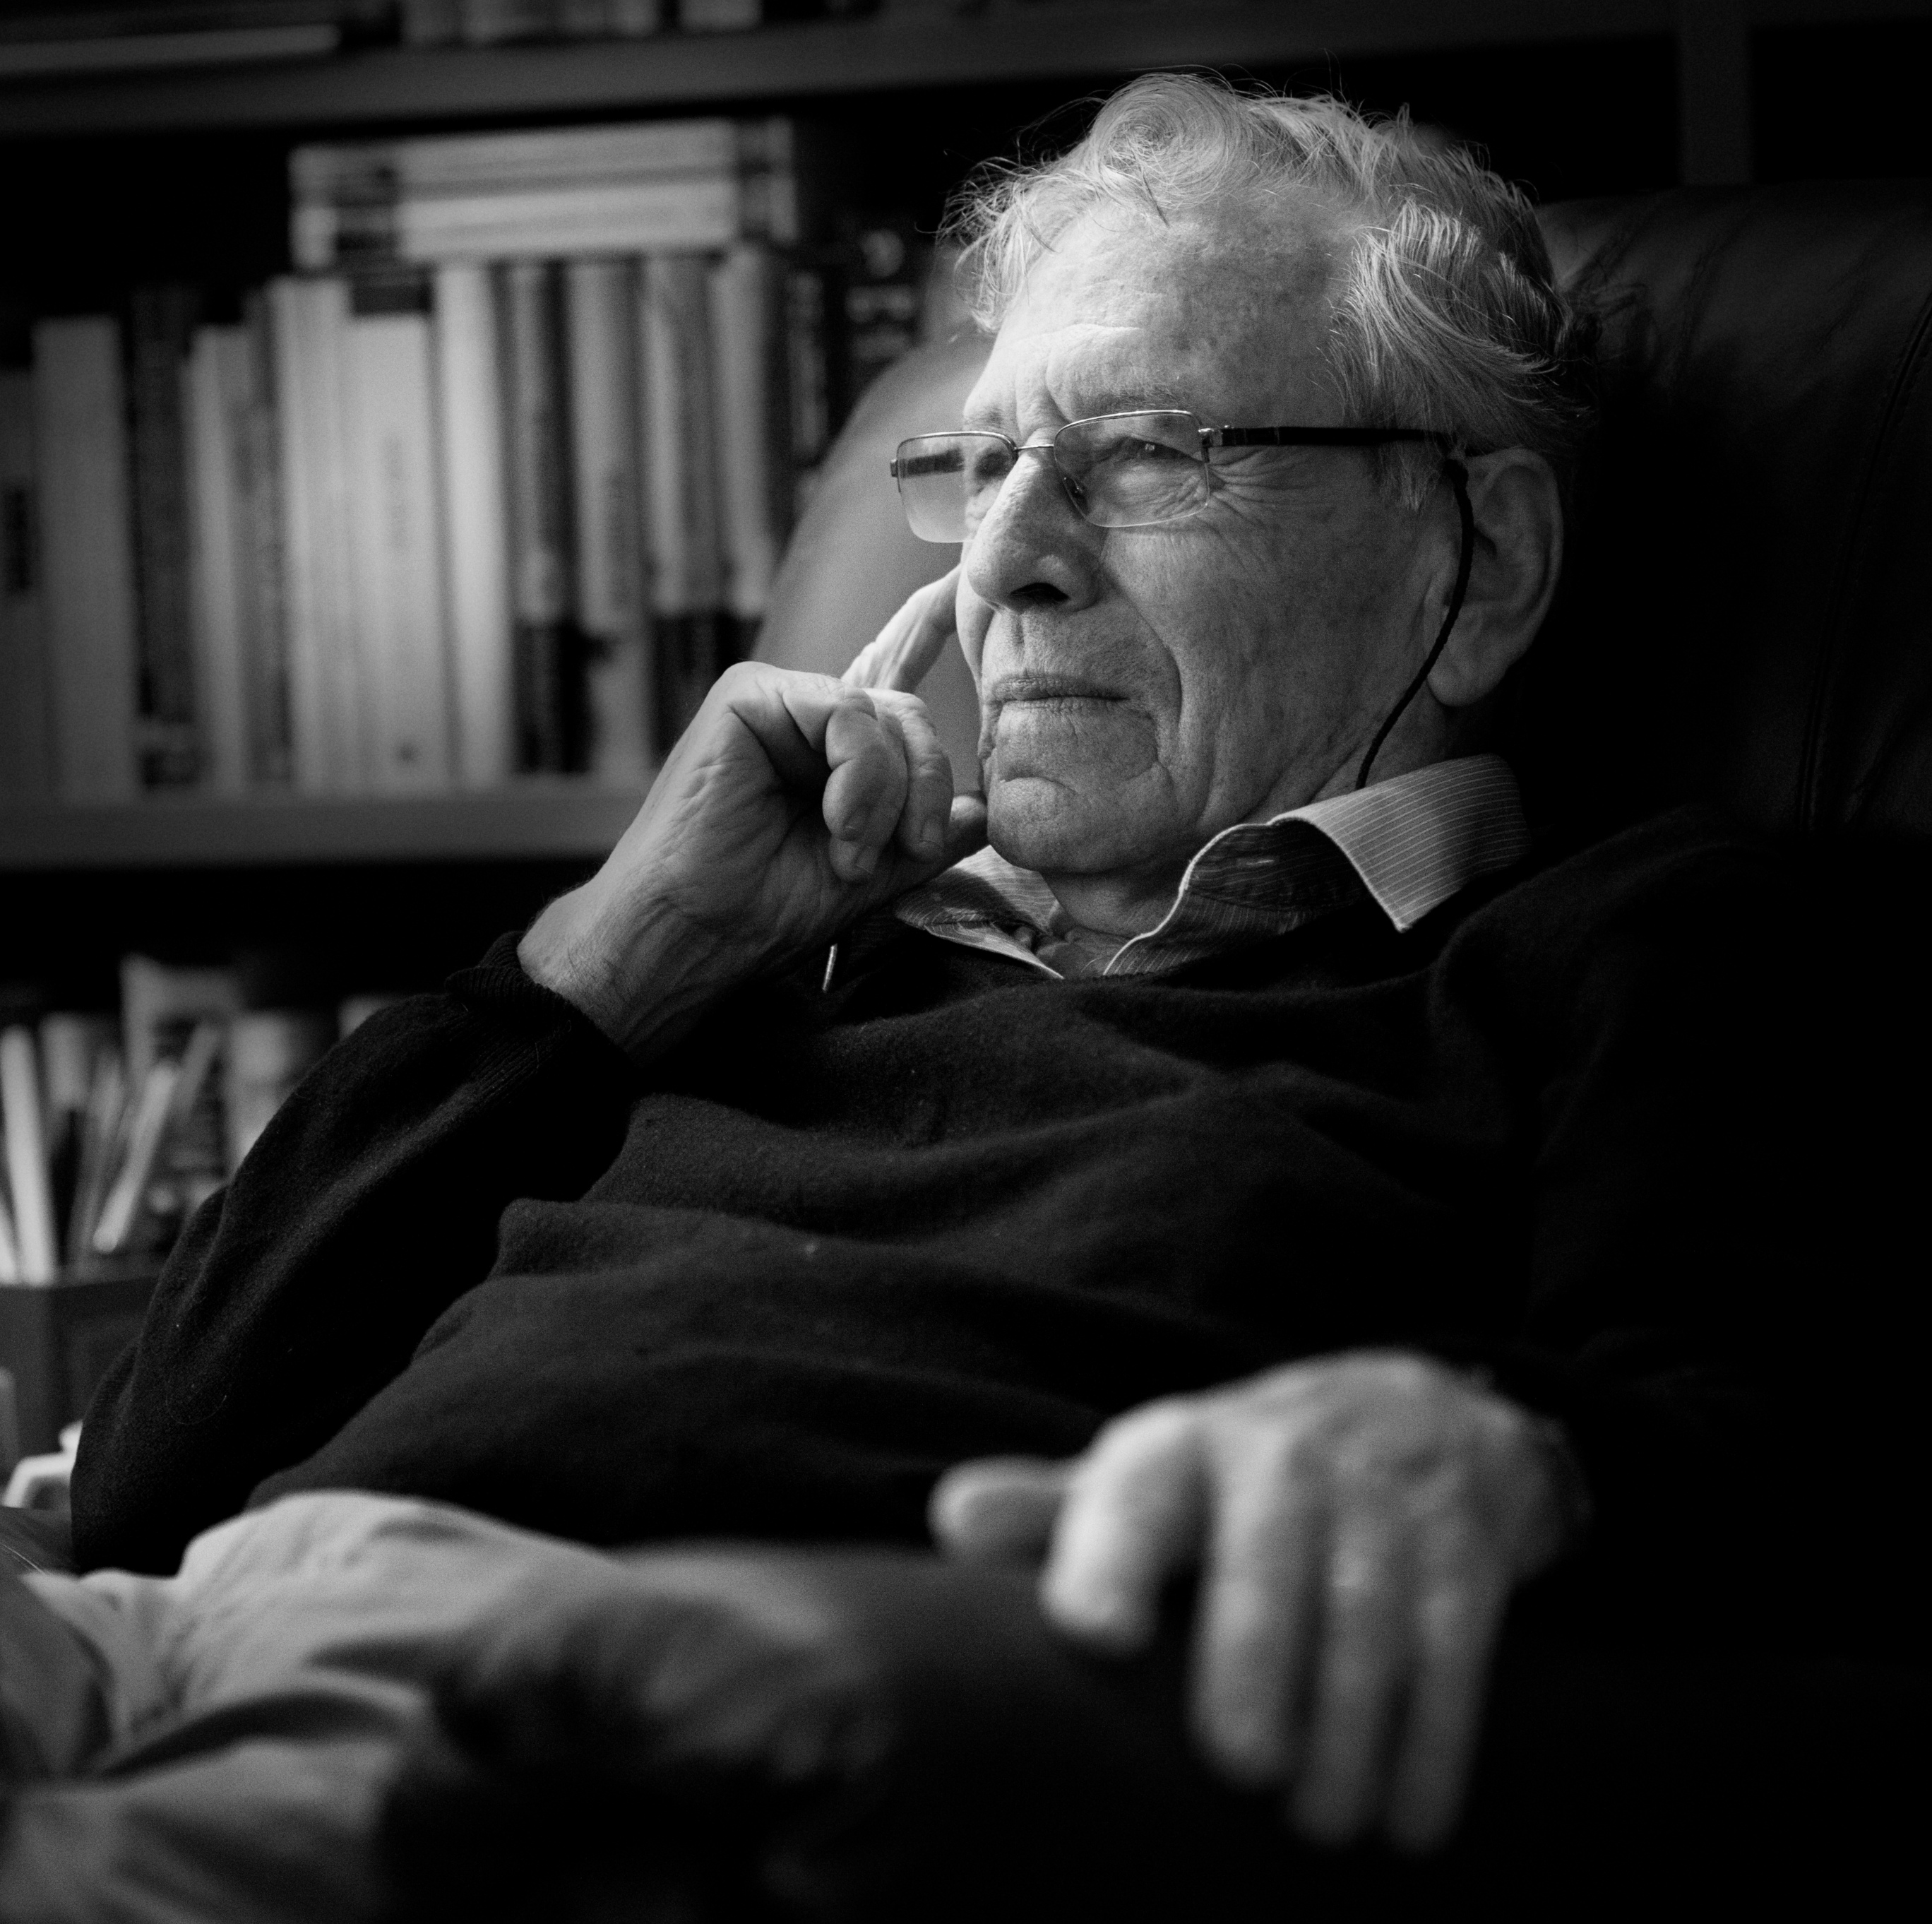 Odlazak velikog pisca: Preminuo je Amos Oz